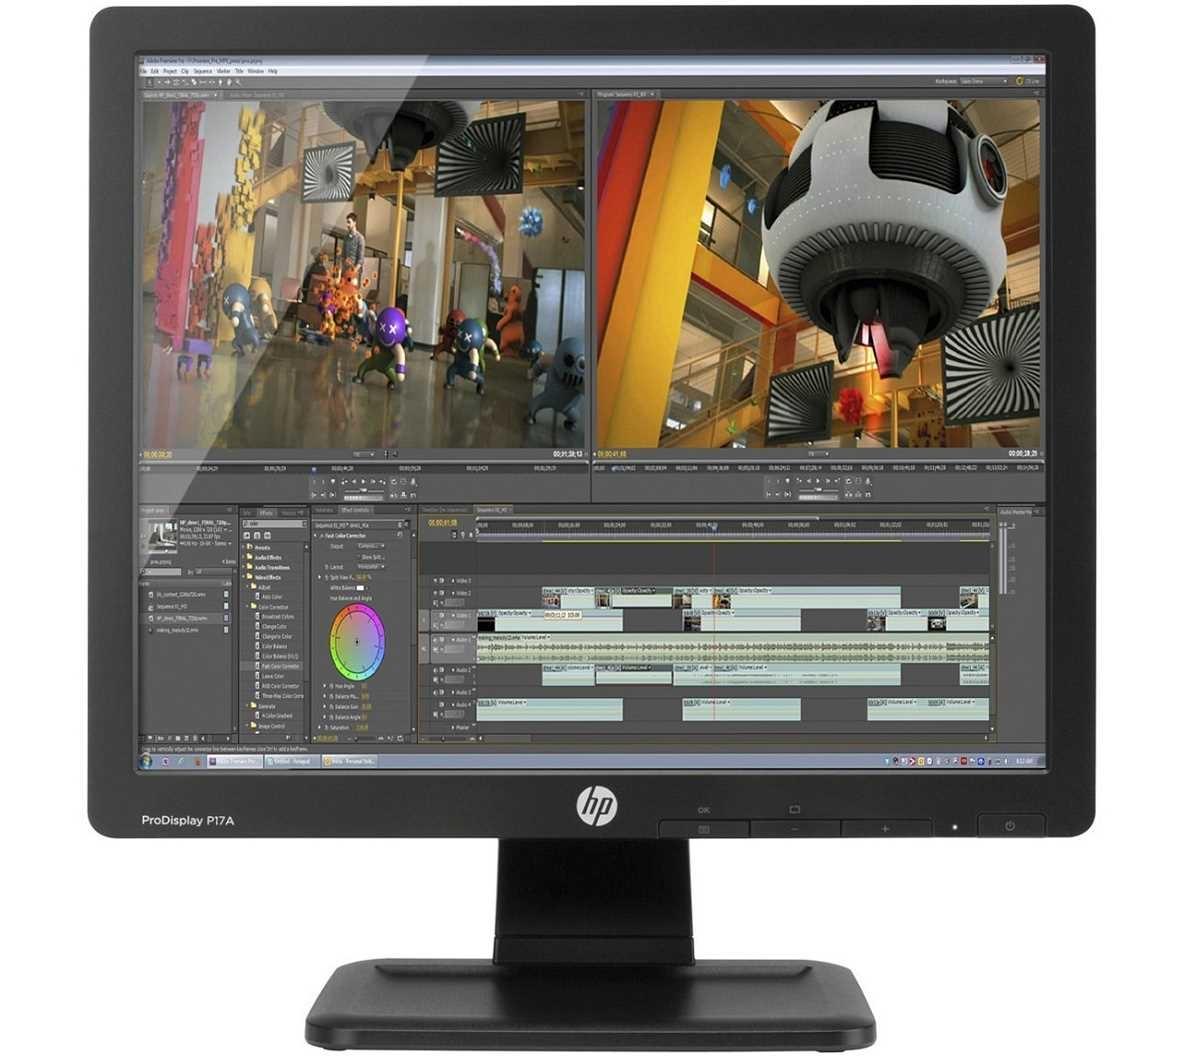 "HP ProDisplay P17A 17"" LED Backlit LCD (1280x1024, 5:4, 250nits, 5ms, VGA)"